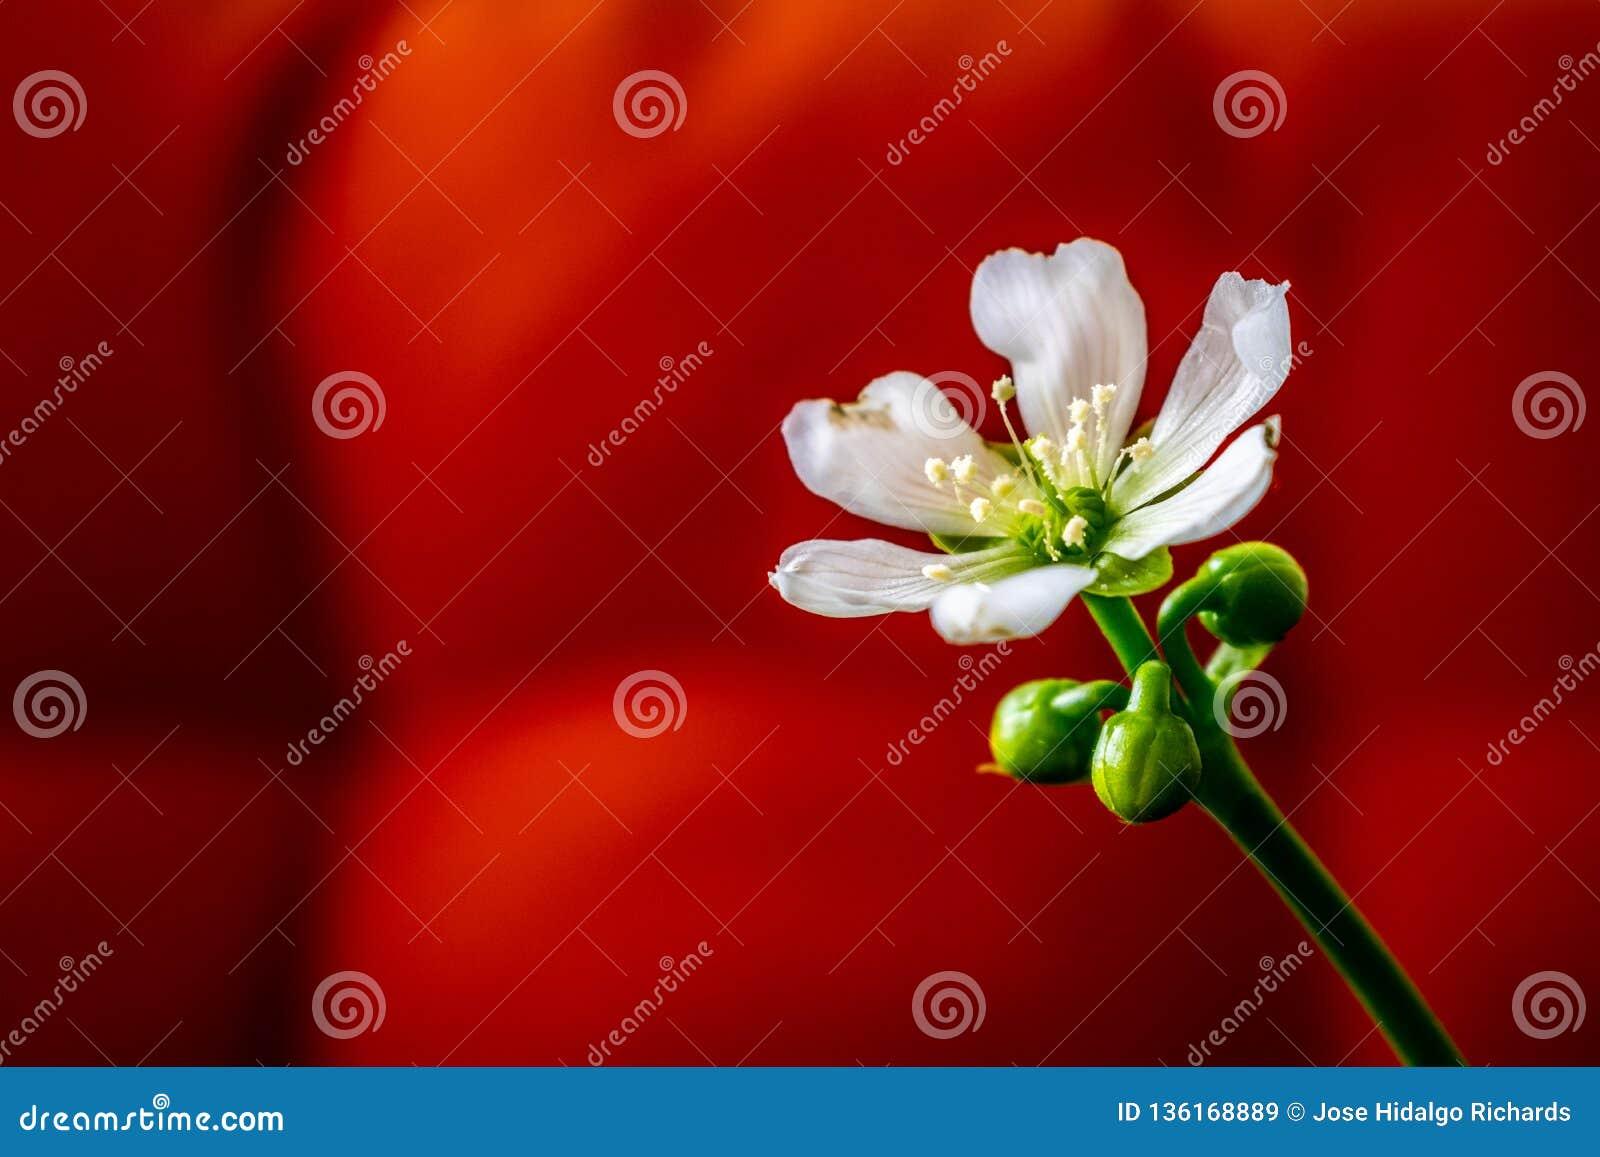 Enkel vit blomma mot en röd bakgrund